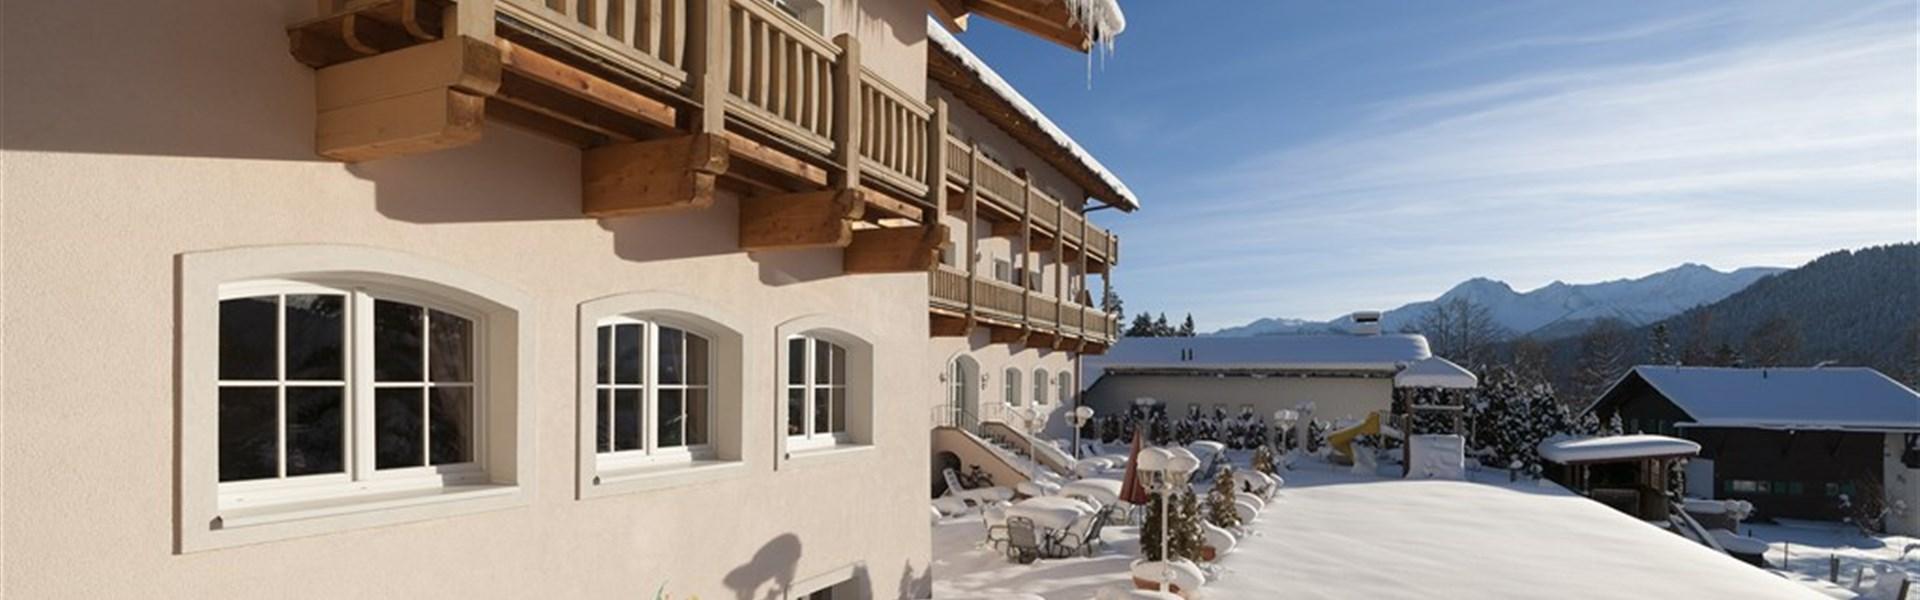 Marco Polo - Waldhotel Seefeld -